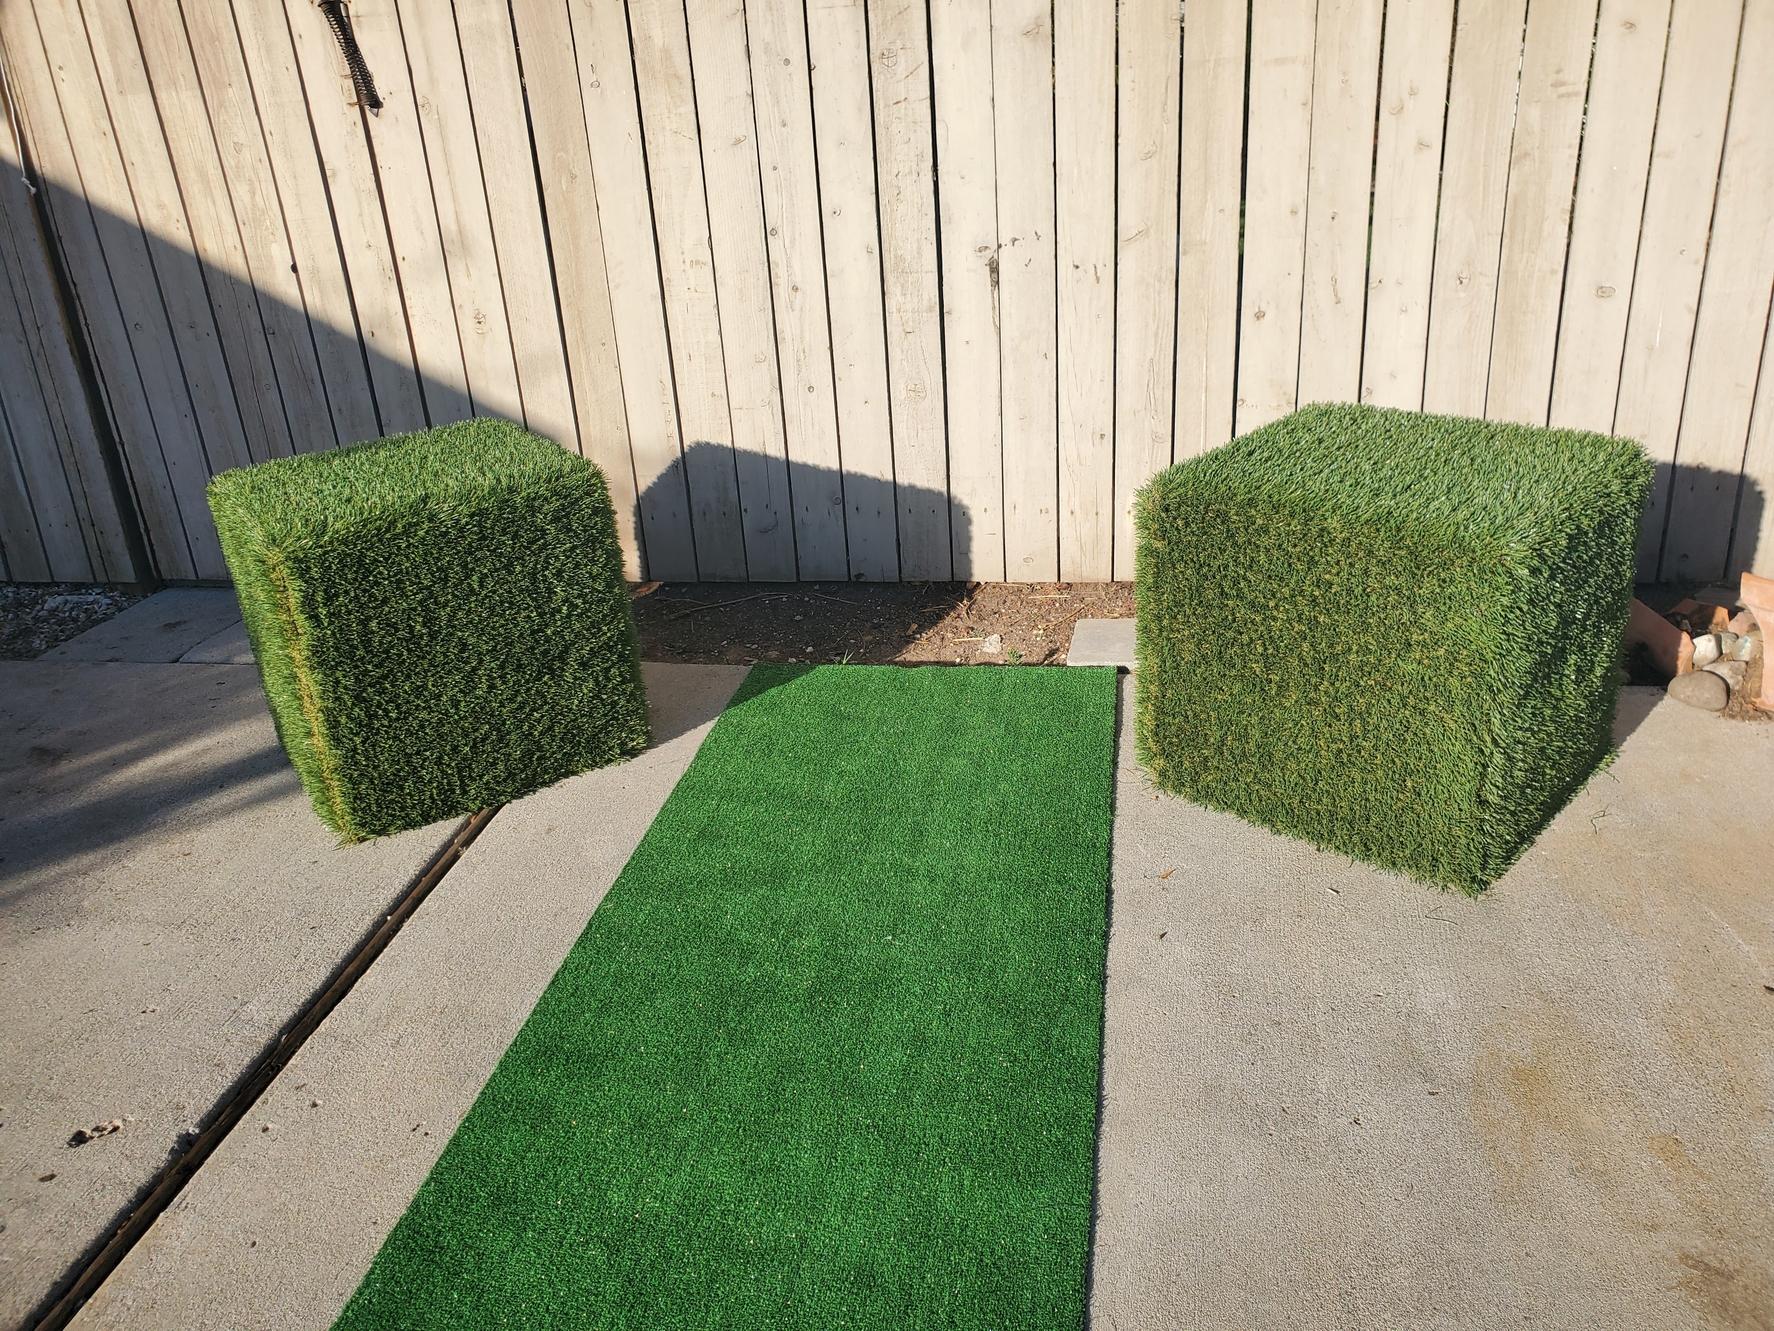 green turf bundle, party rentals near me